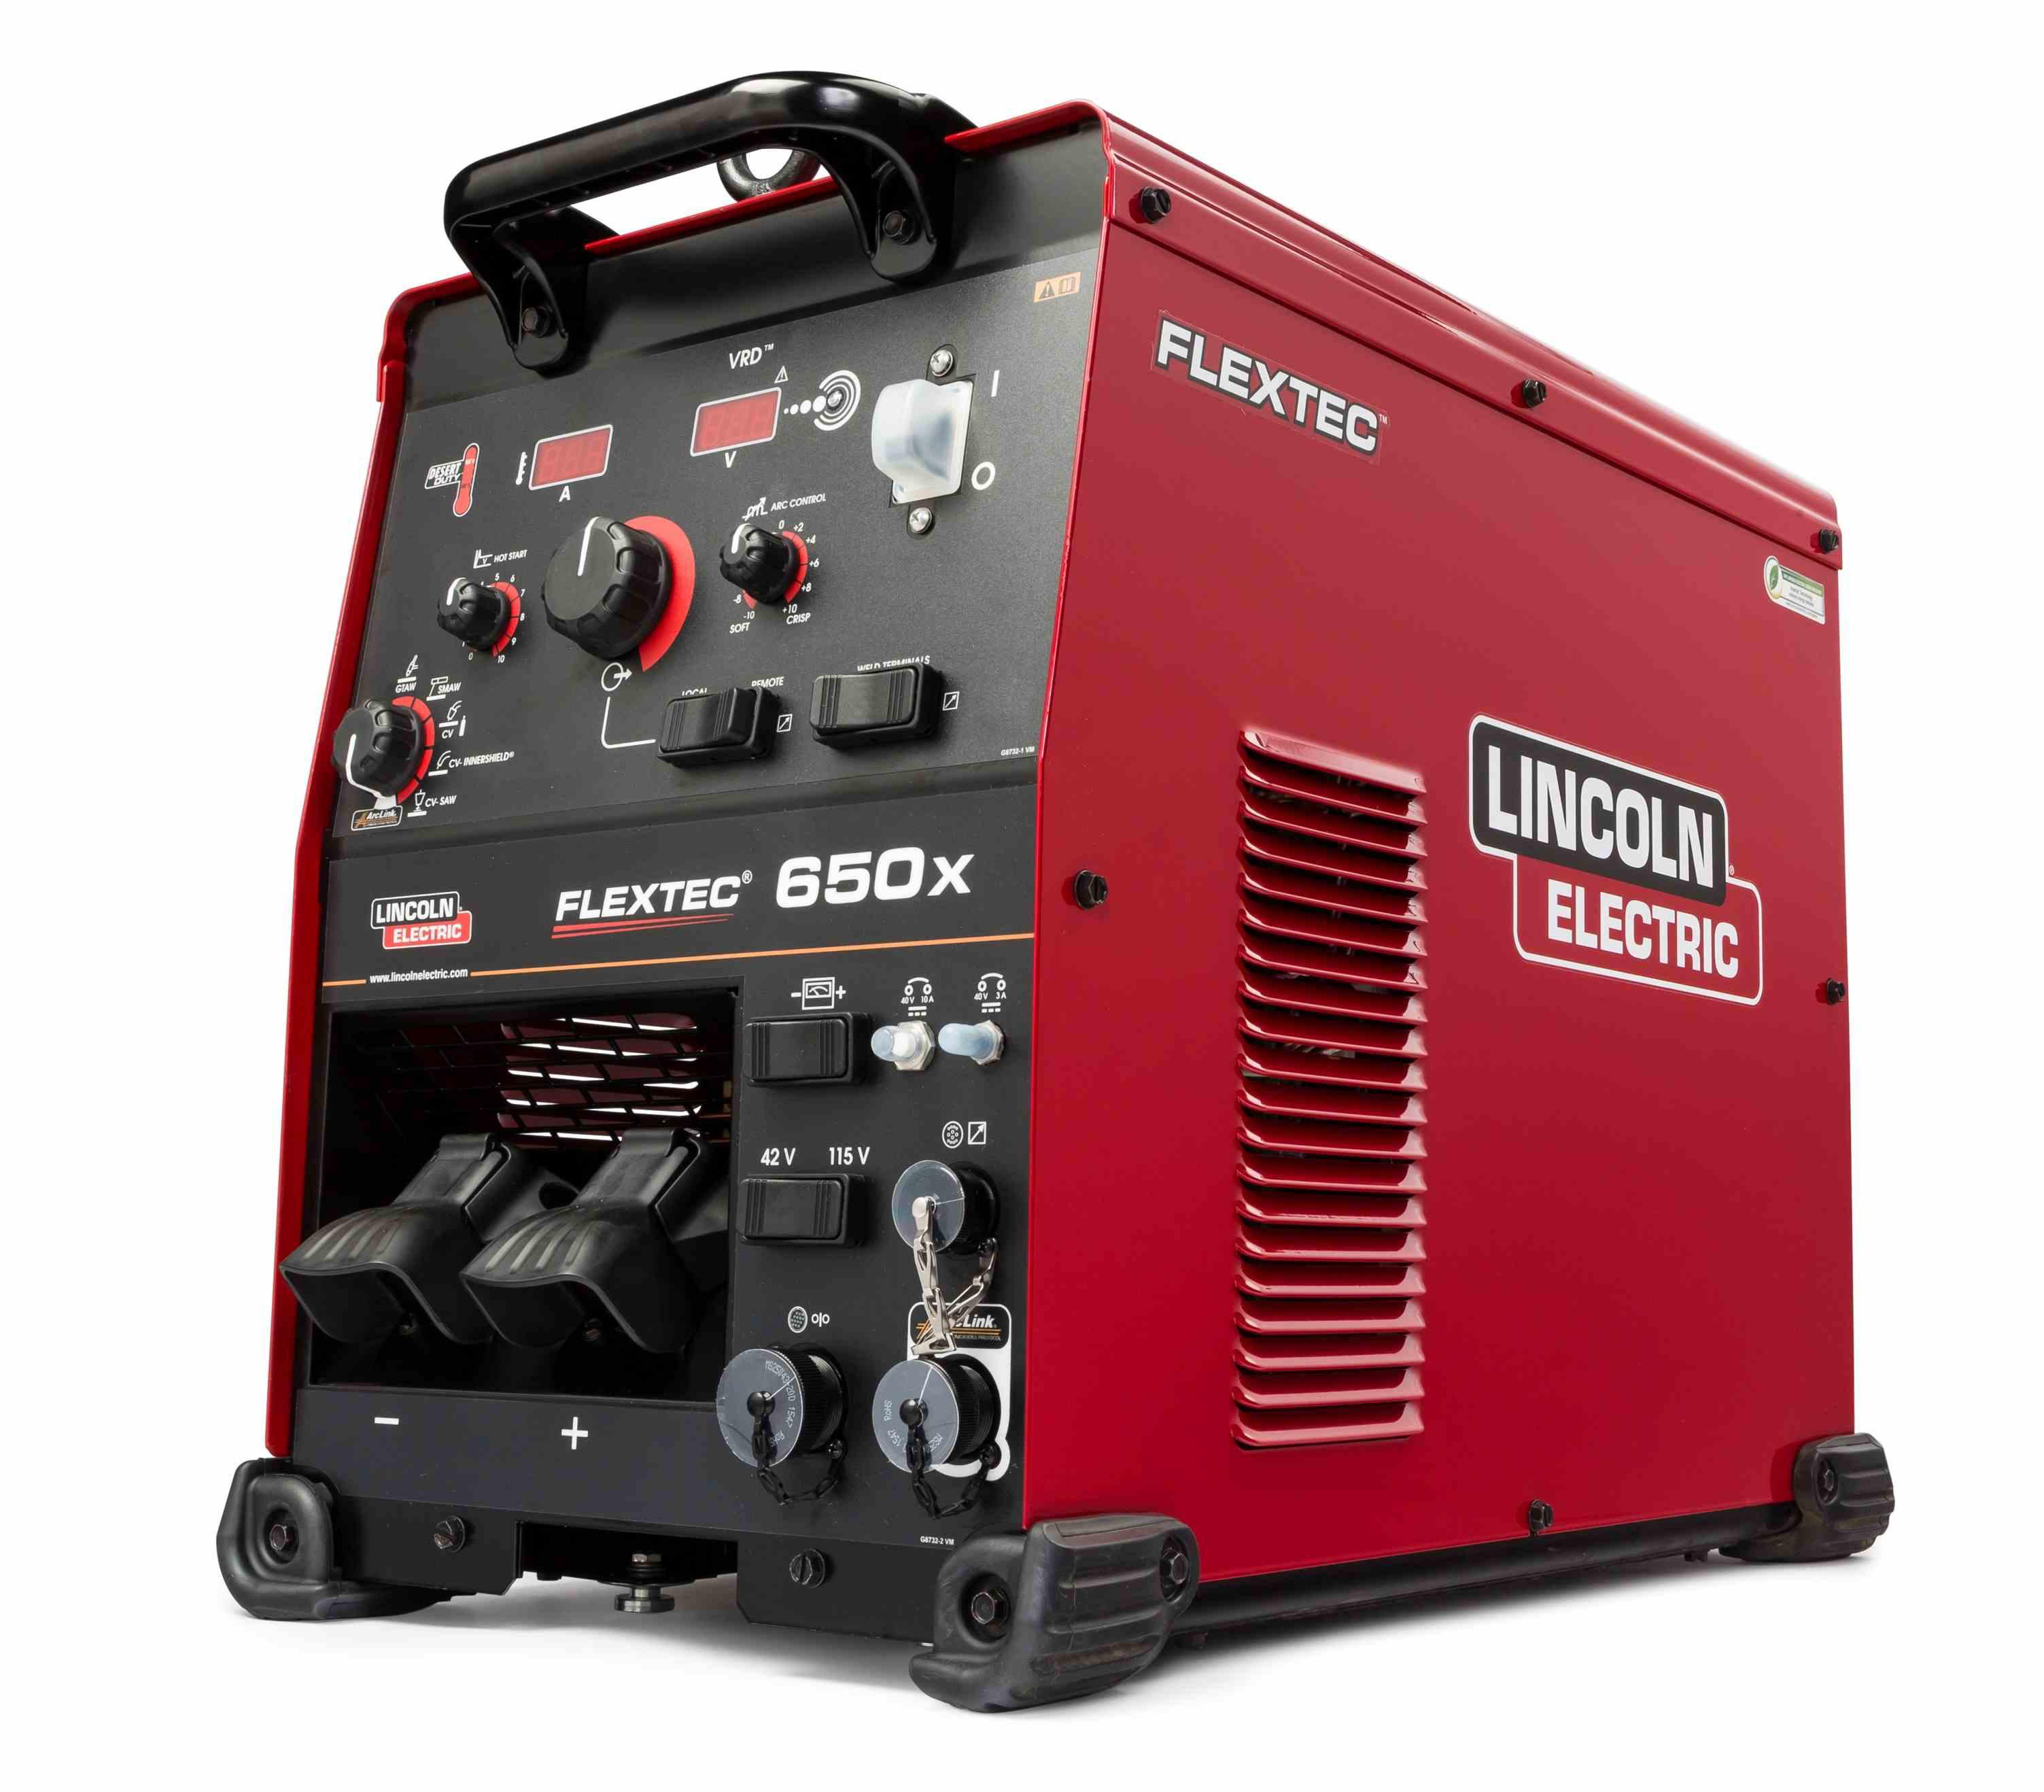 welder process com pak mig lincoln multi dp power tig amazon wire mp electric one